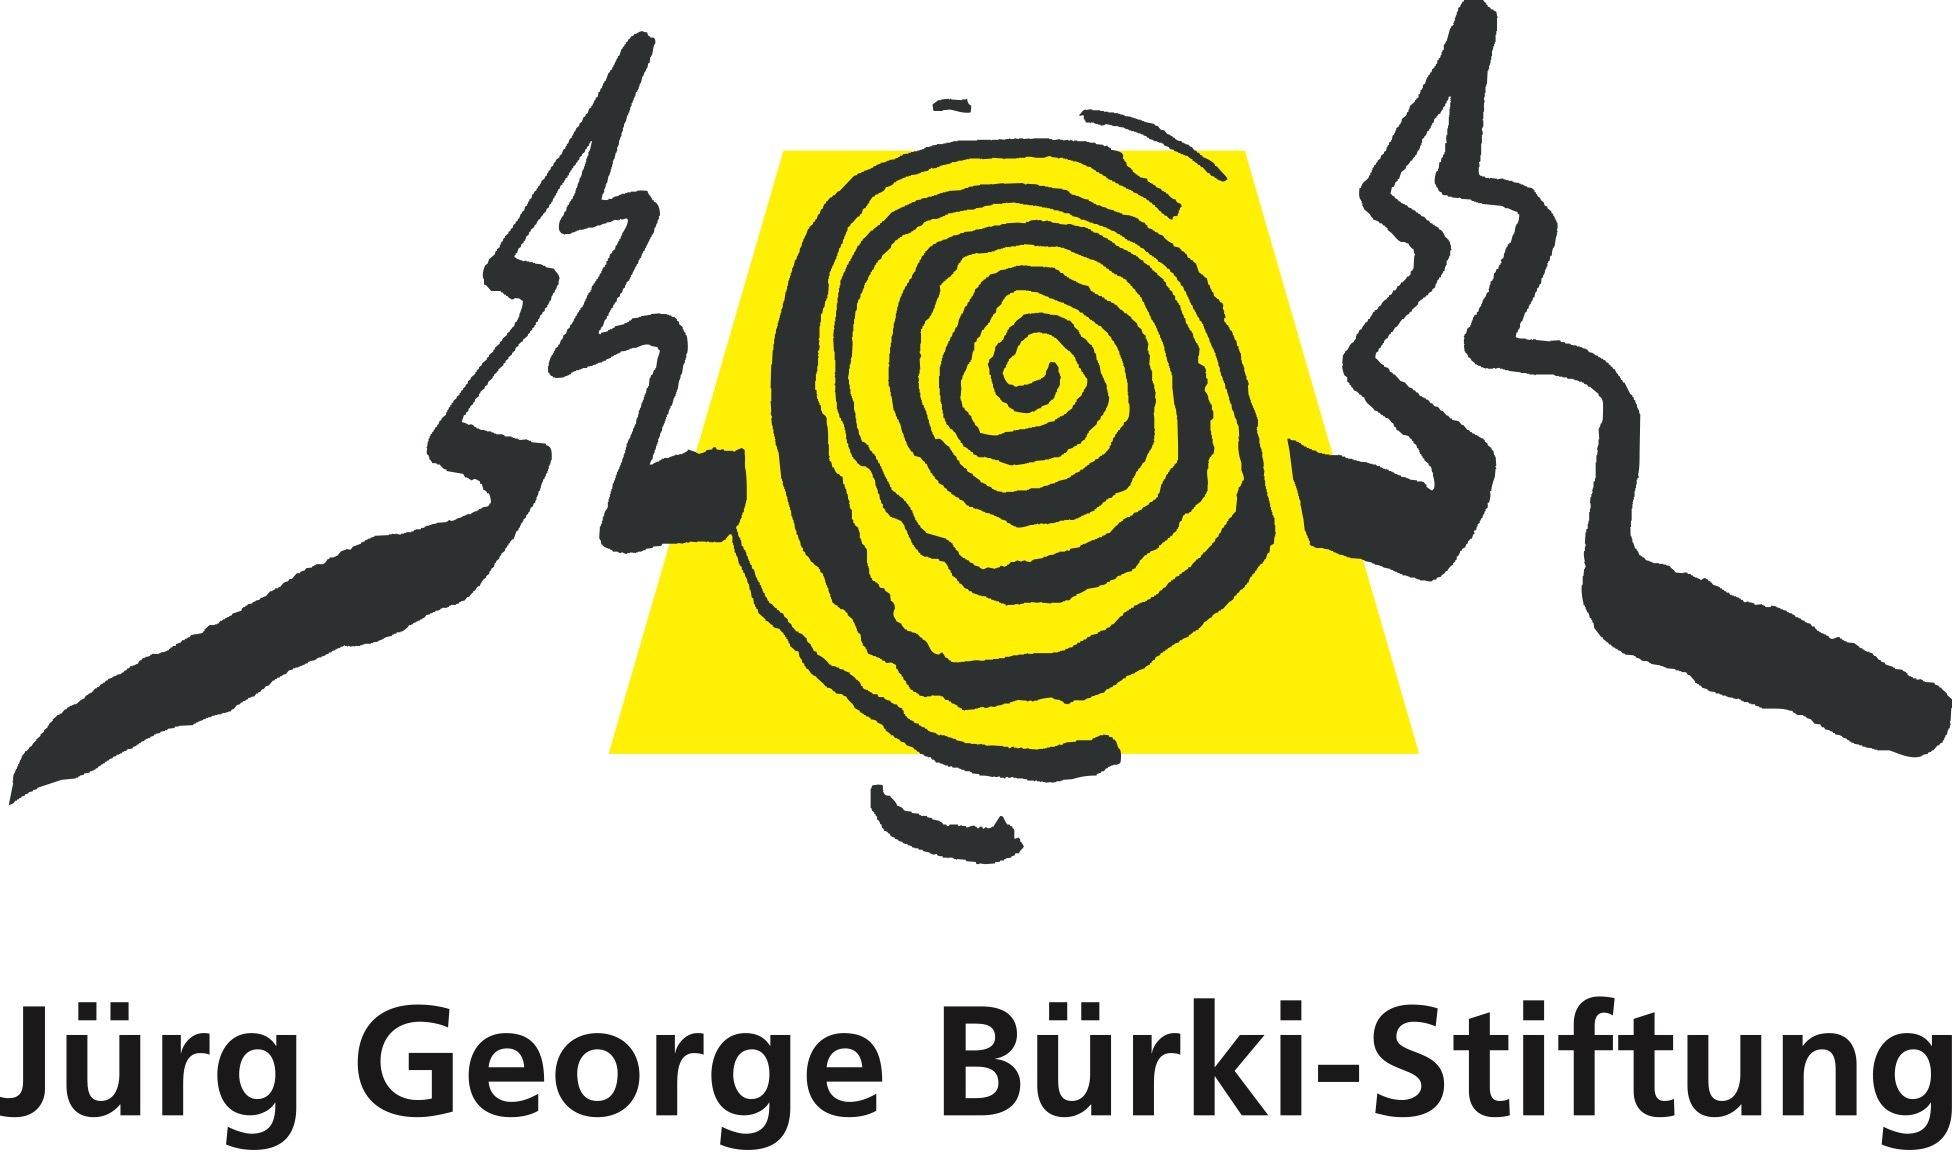 Jürg George Bürki-Stiftung (Varieté)